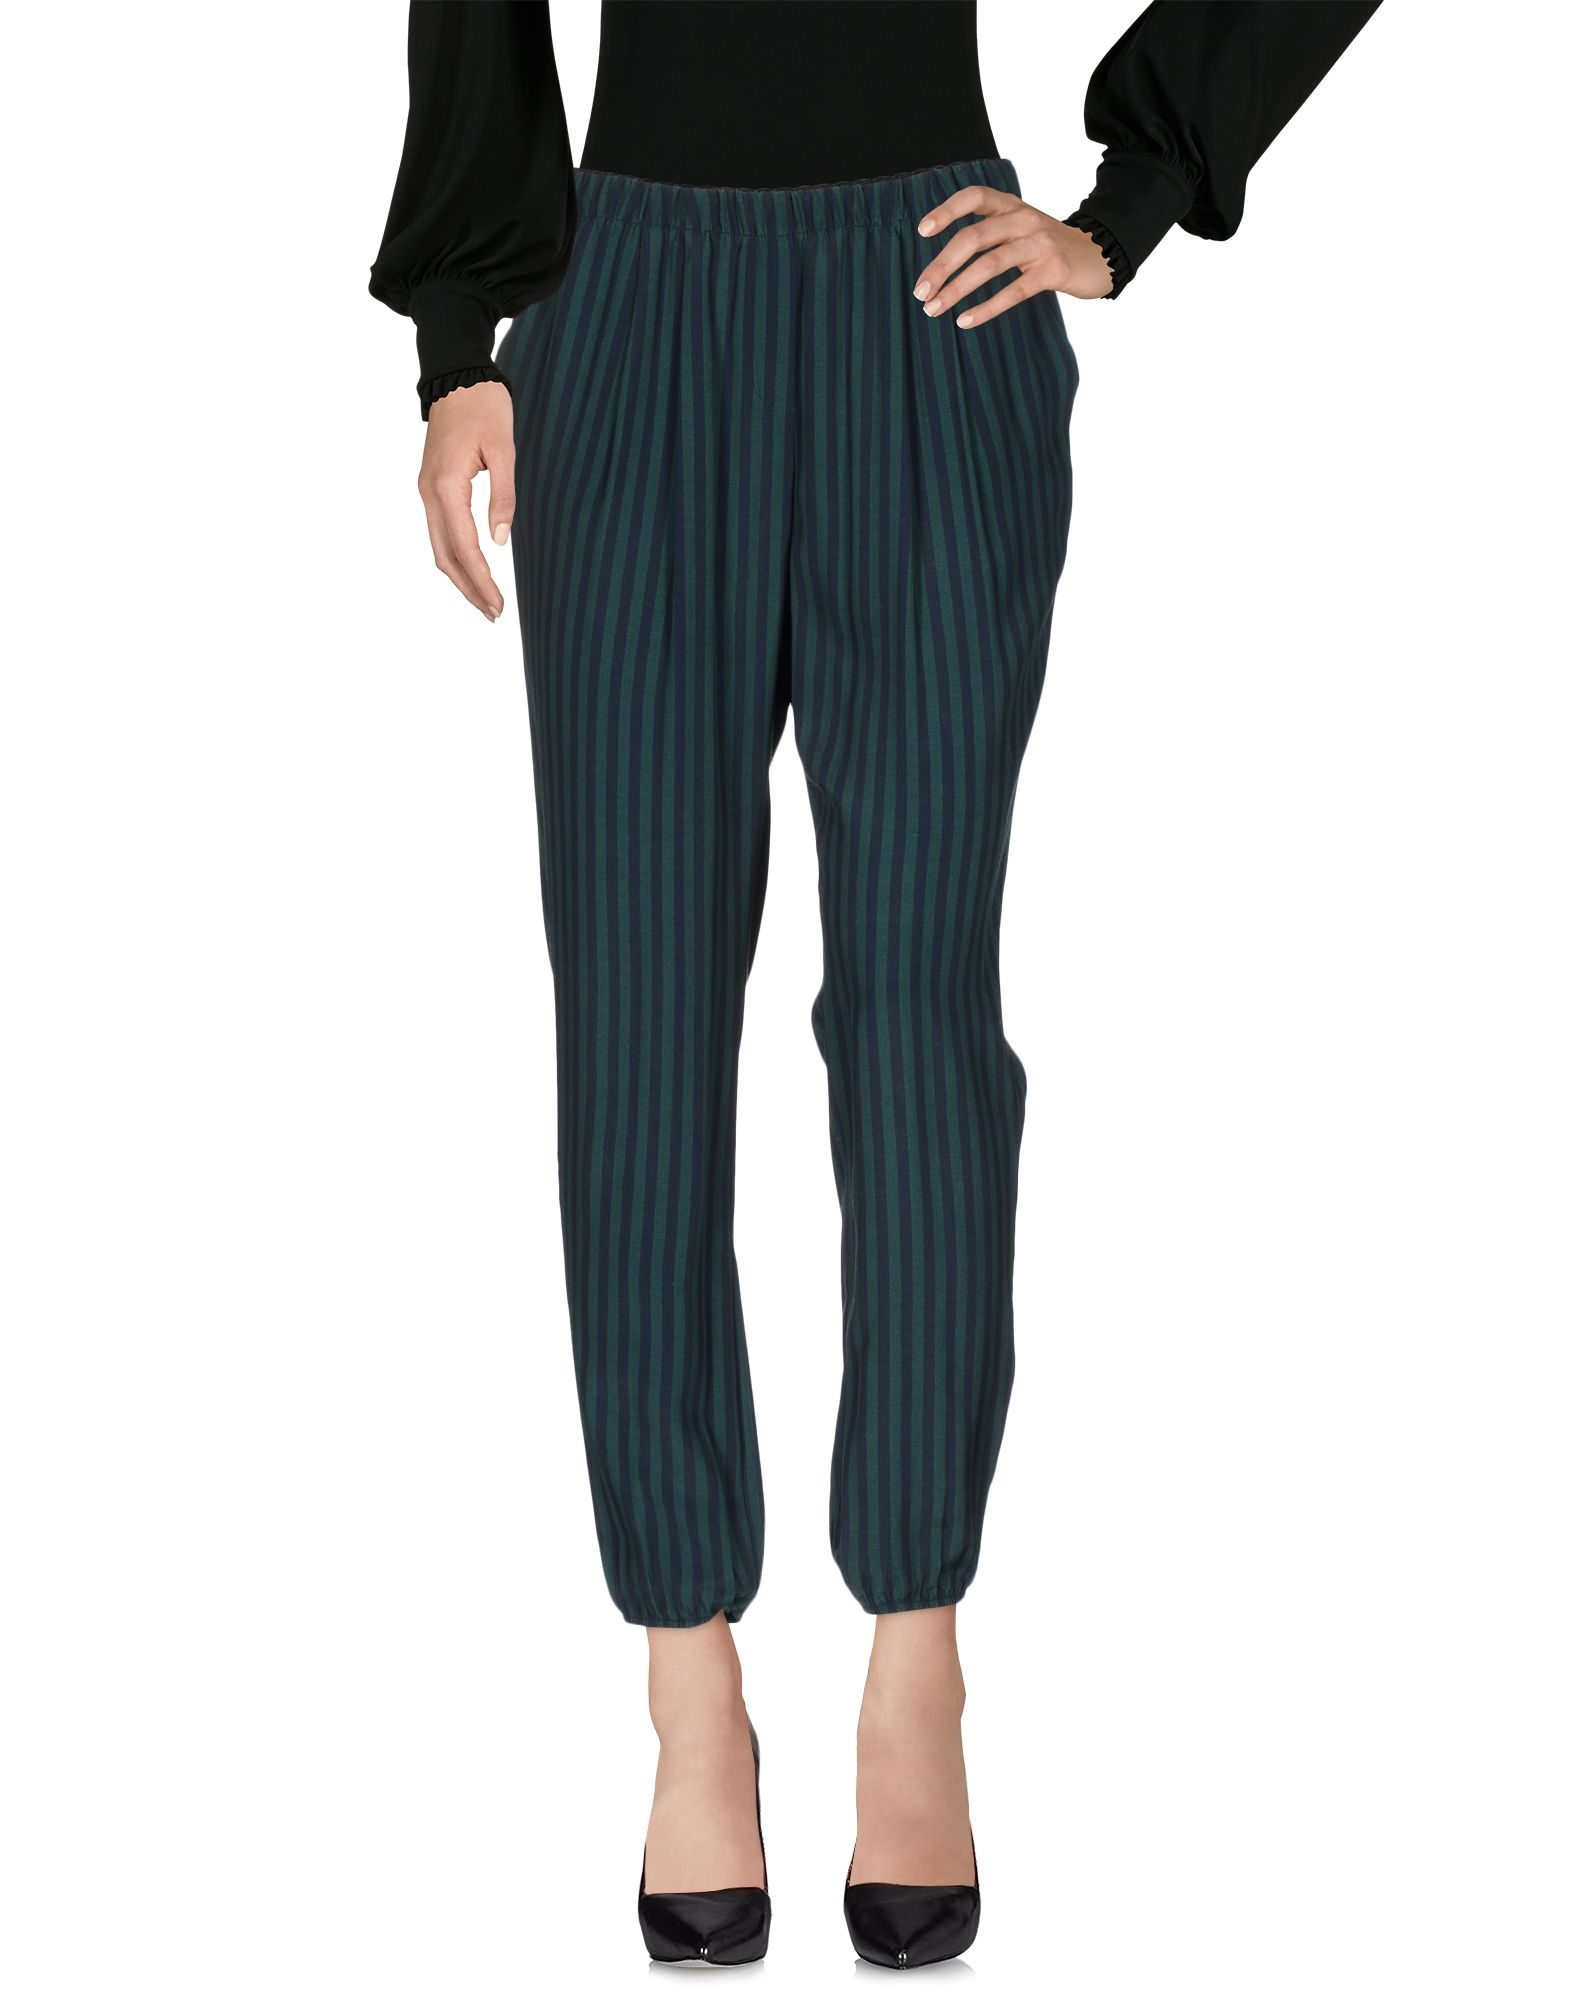 ANIYE BY Damen Hose Farbe Dunkelgrün Größe 5